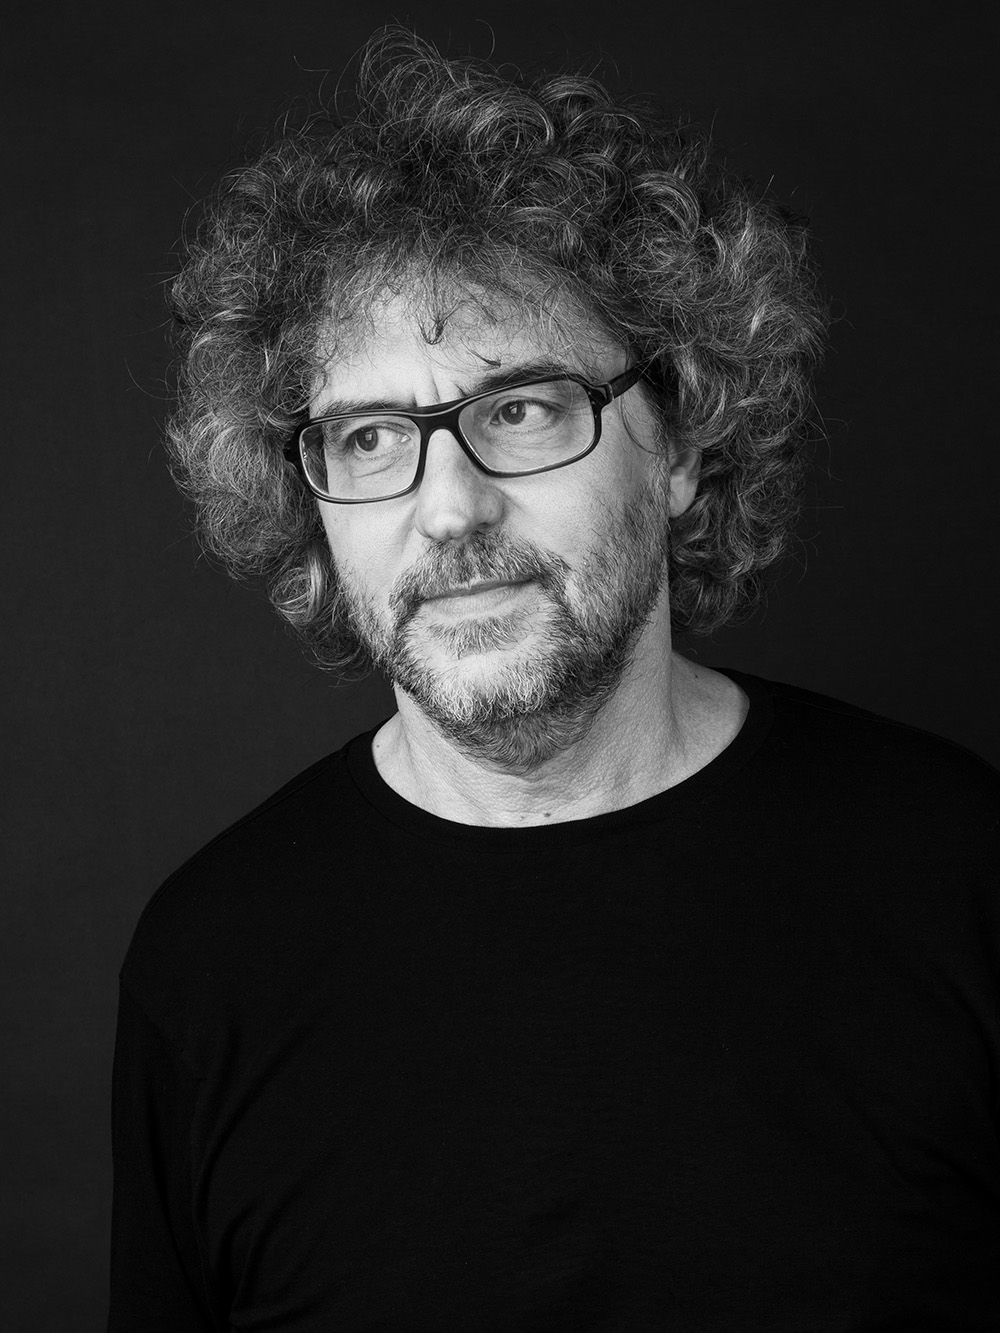 Alessandro Pizzolato